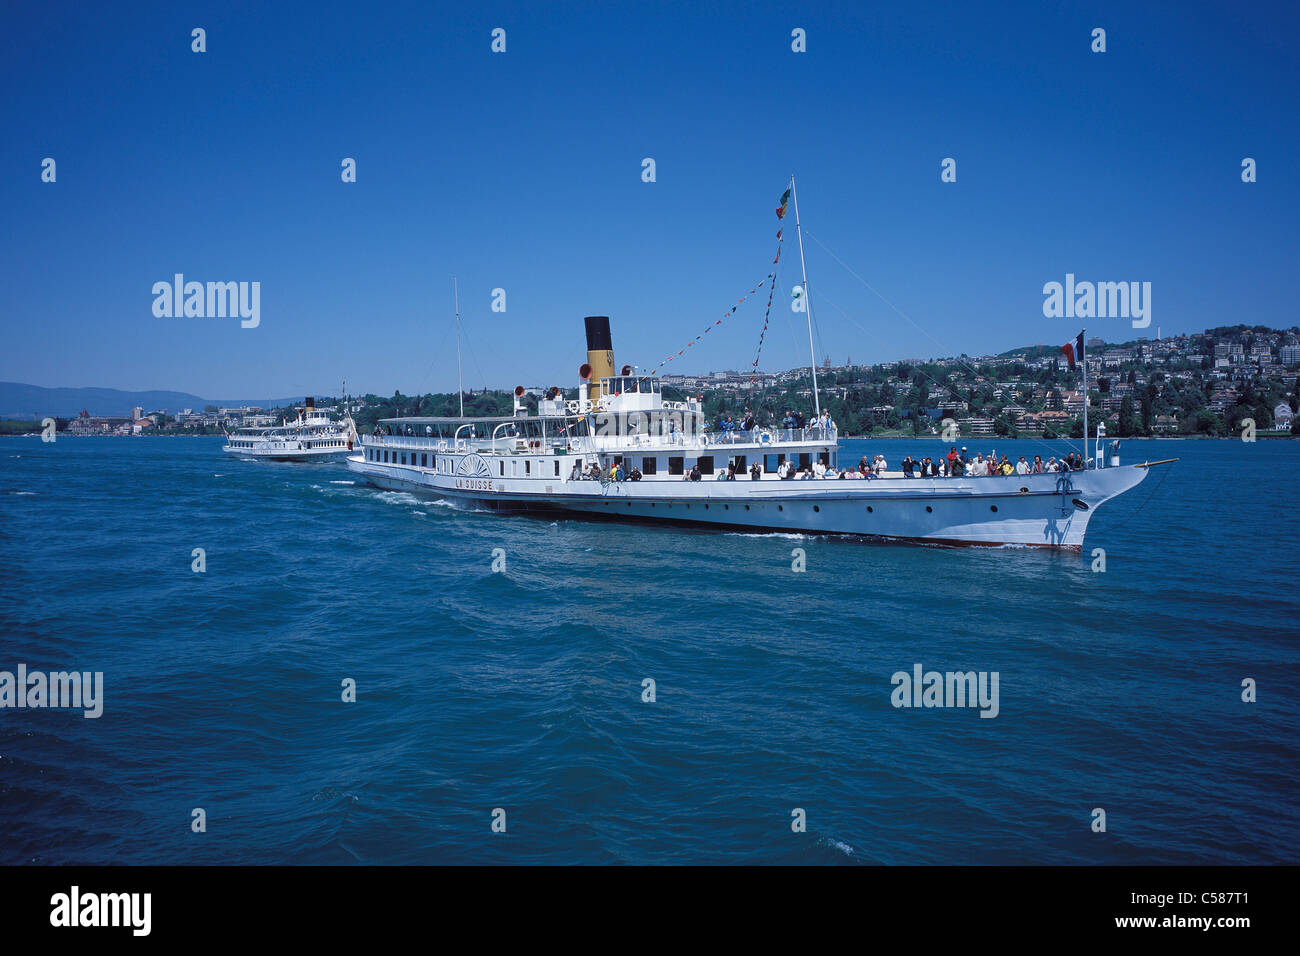 Ships, ship, C.G.N, paddle steamer, steamboat, summer, blue, Lac Léman, lake Geneva, lake, ship, ships, ship, - Stock Image